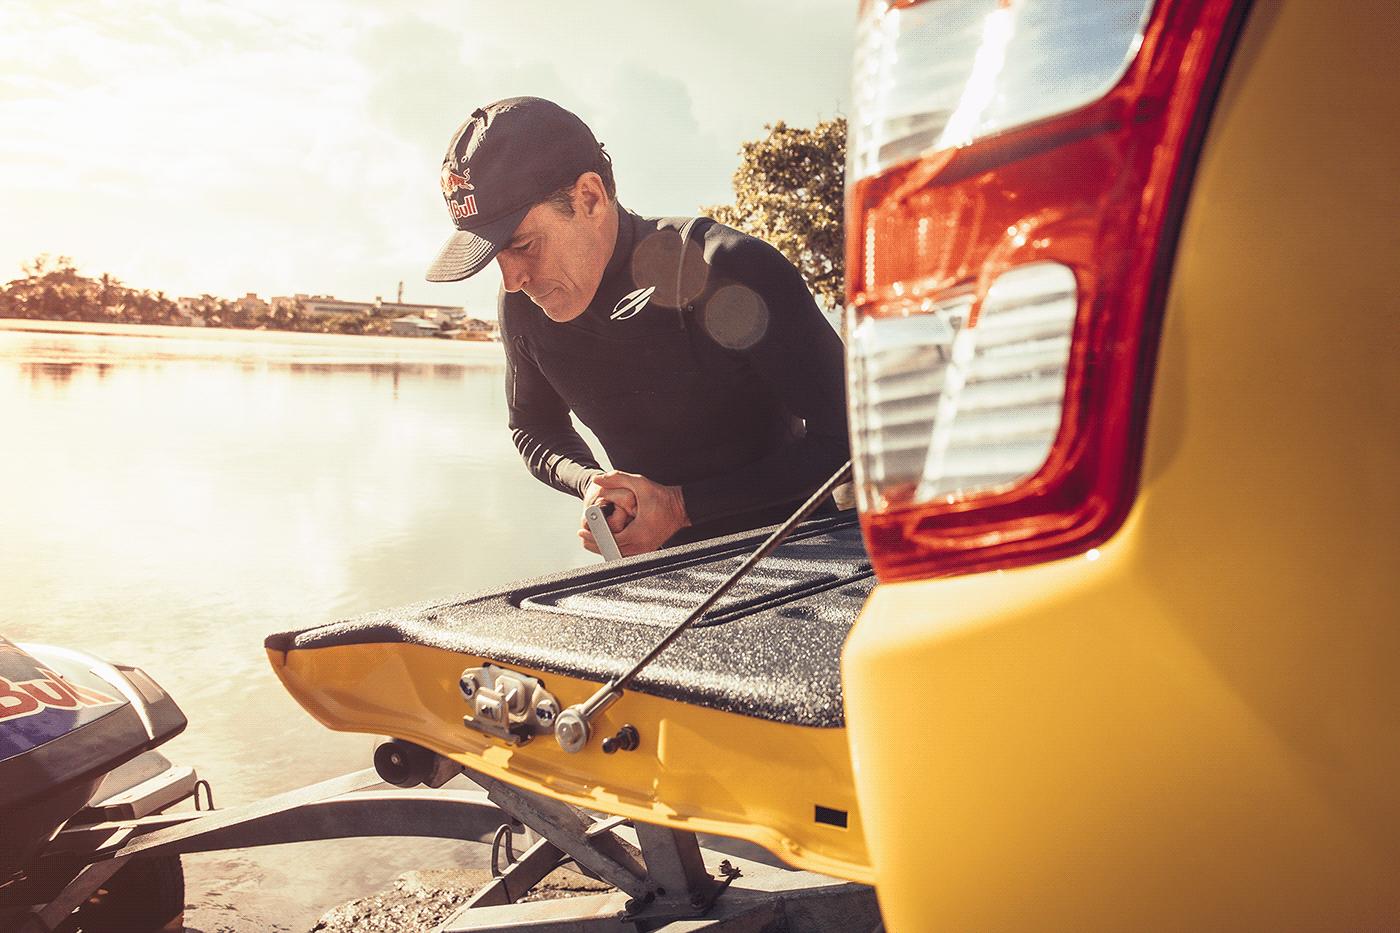 Automotive Photography carlos burle Mitsubishi Mitsubishi l200 triton Pablo Vaz savana sectoronebrand surfboard